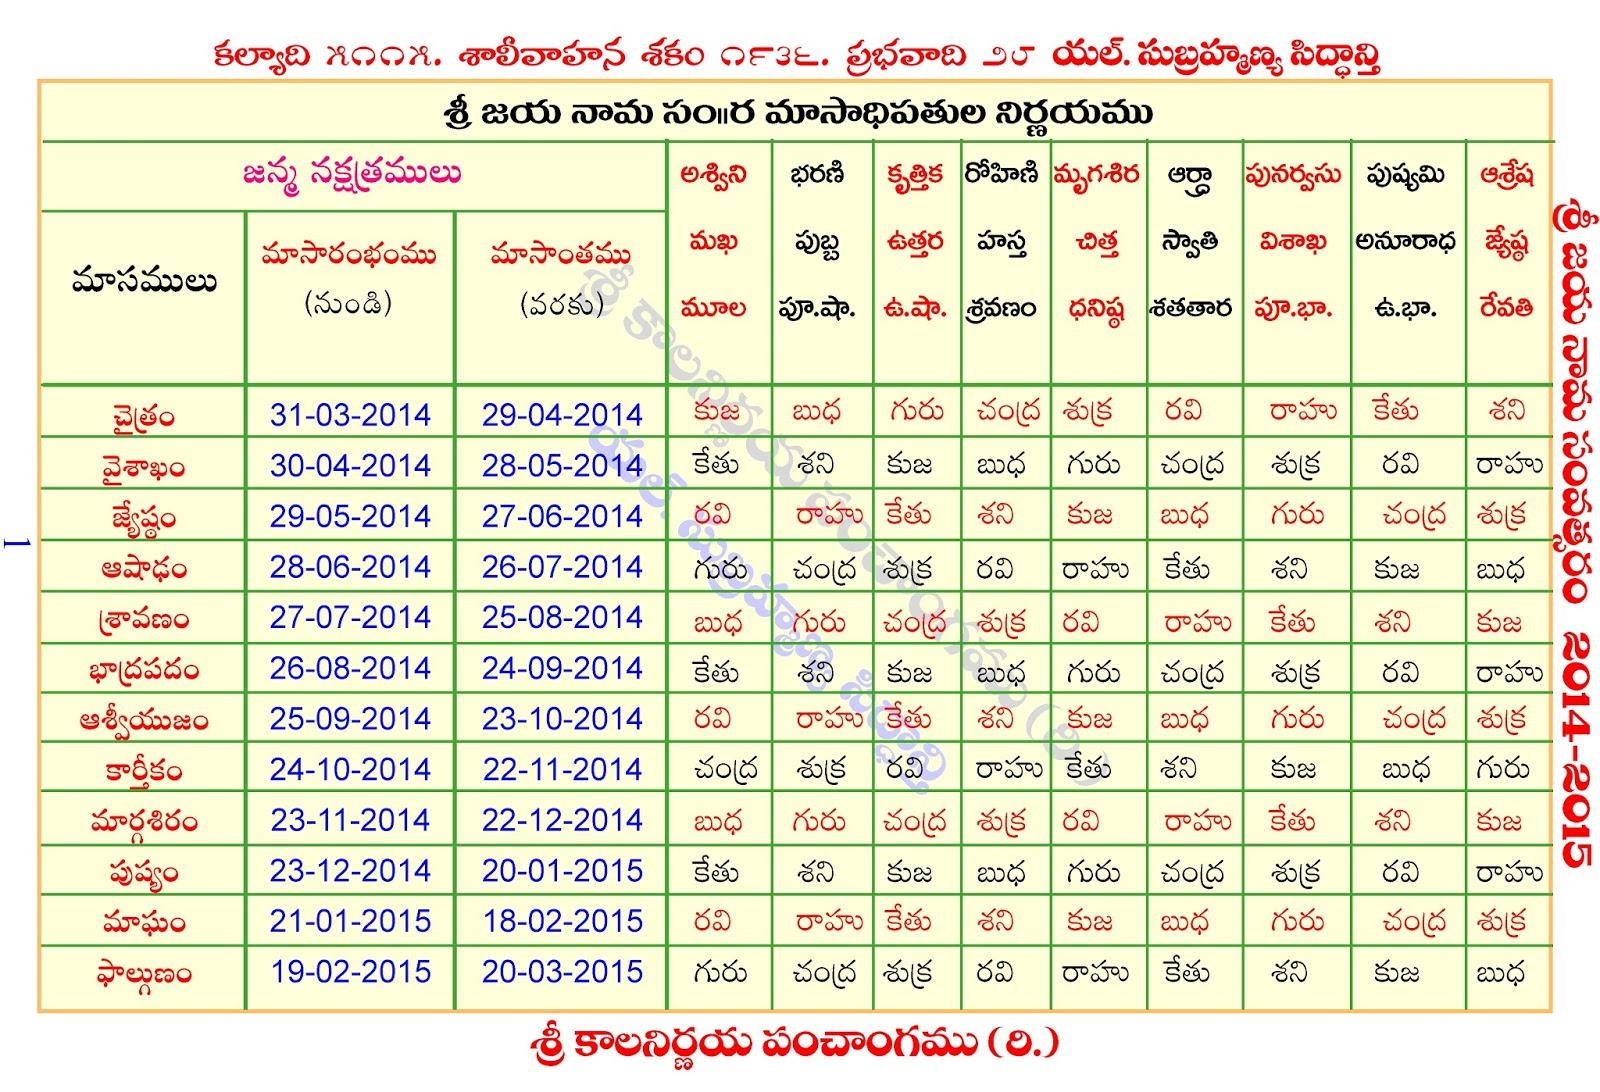 Telugu Celendar Pandogalu   New Calendar Template Site